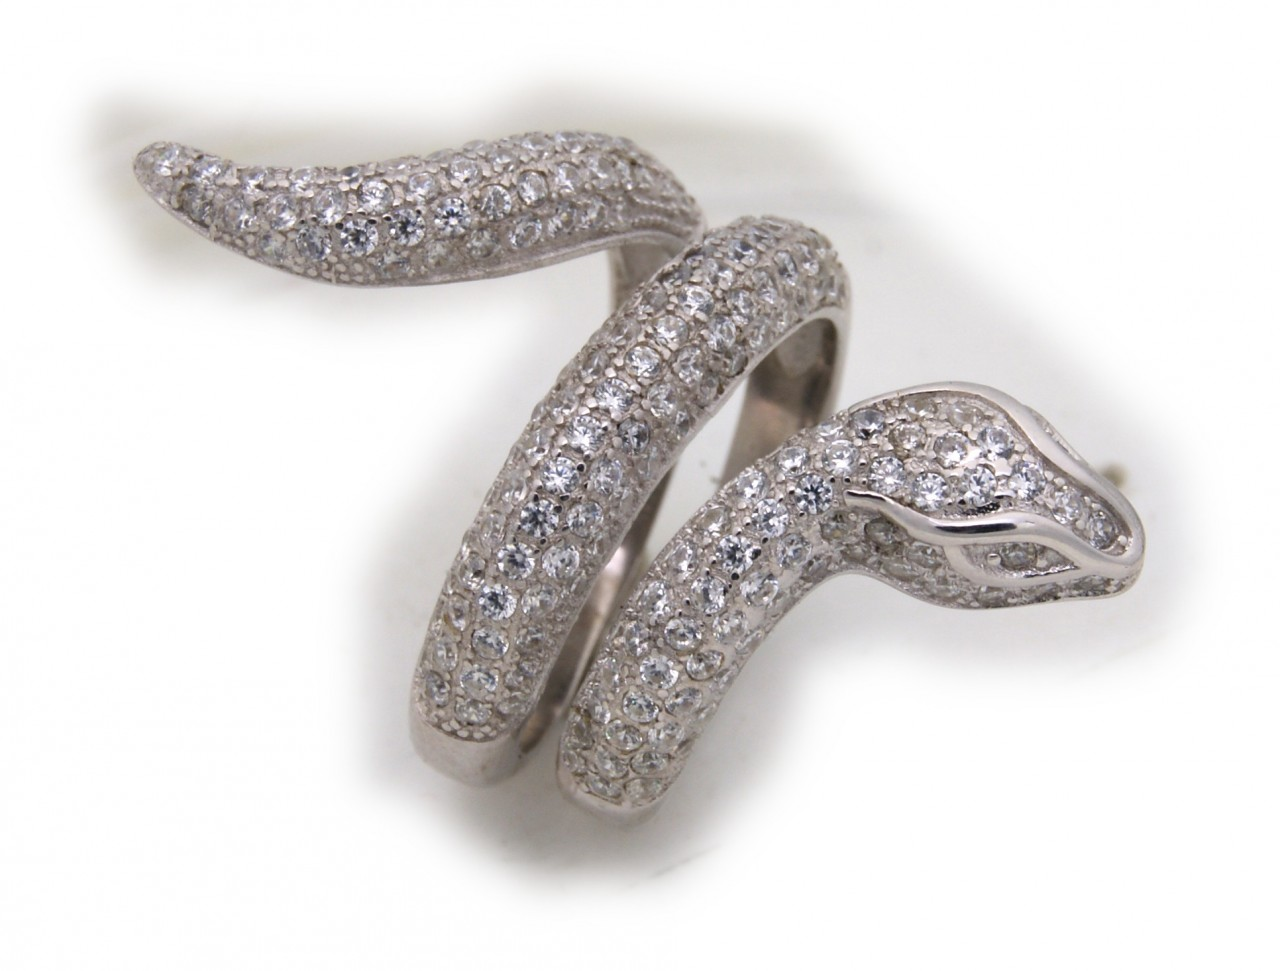 exkl. Schlangenring echt Silber 925 mit Zirkonia Ring Schlange Sterlingsilber